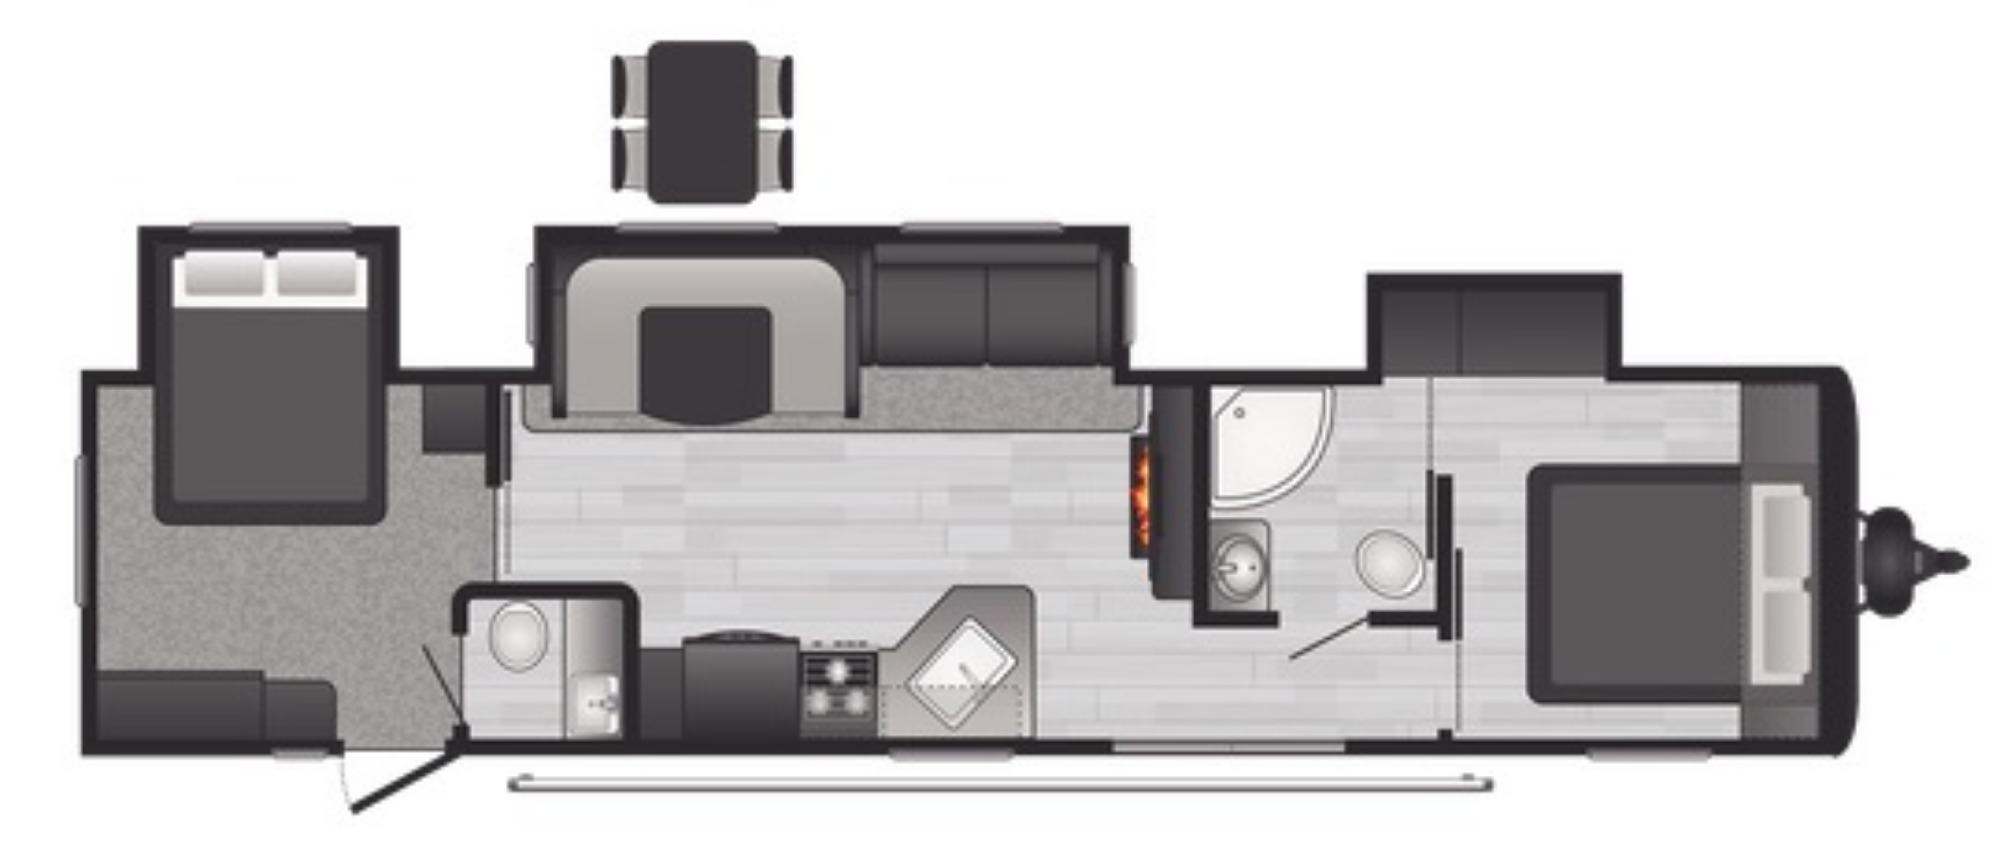 View Floor Plan for 2021 KEYSTONE HIDEOUT 38FQTS